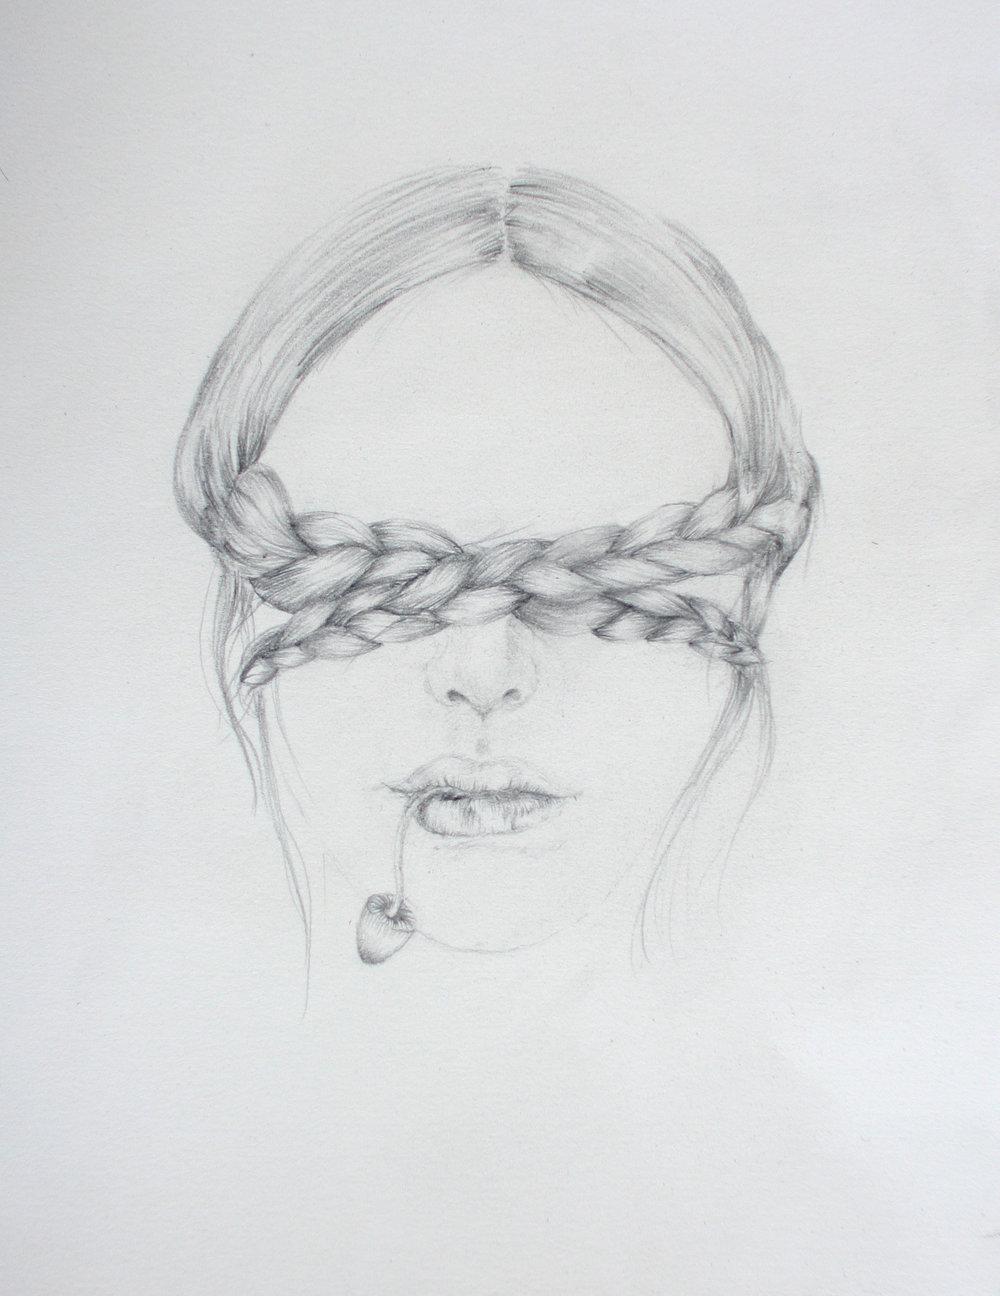 braid_blind.jpg